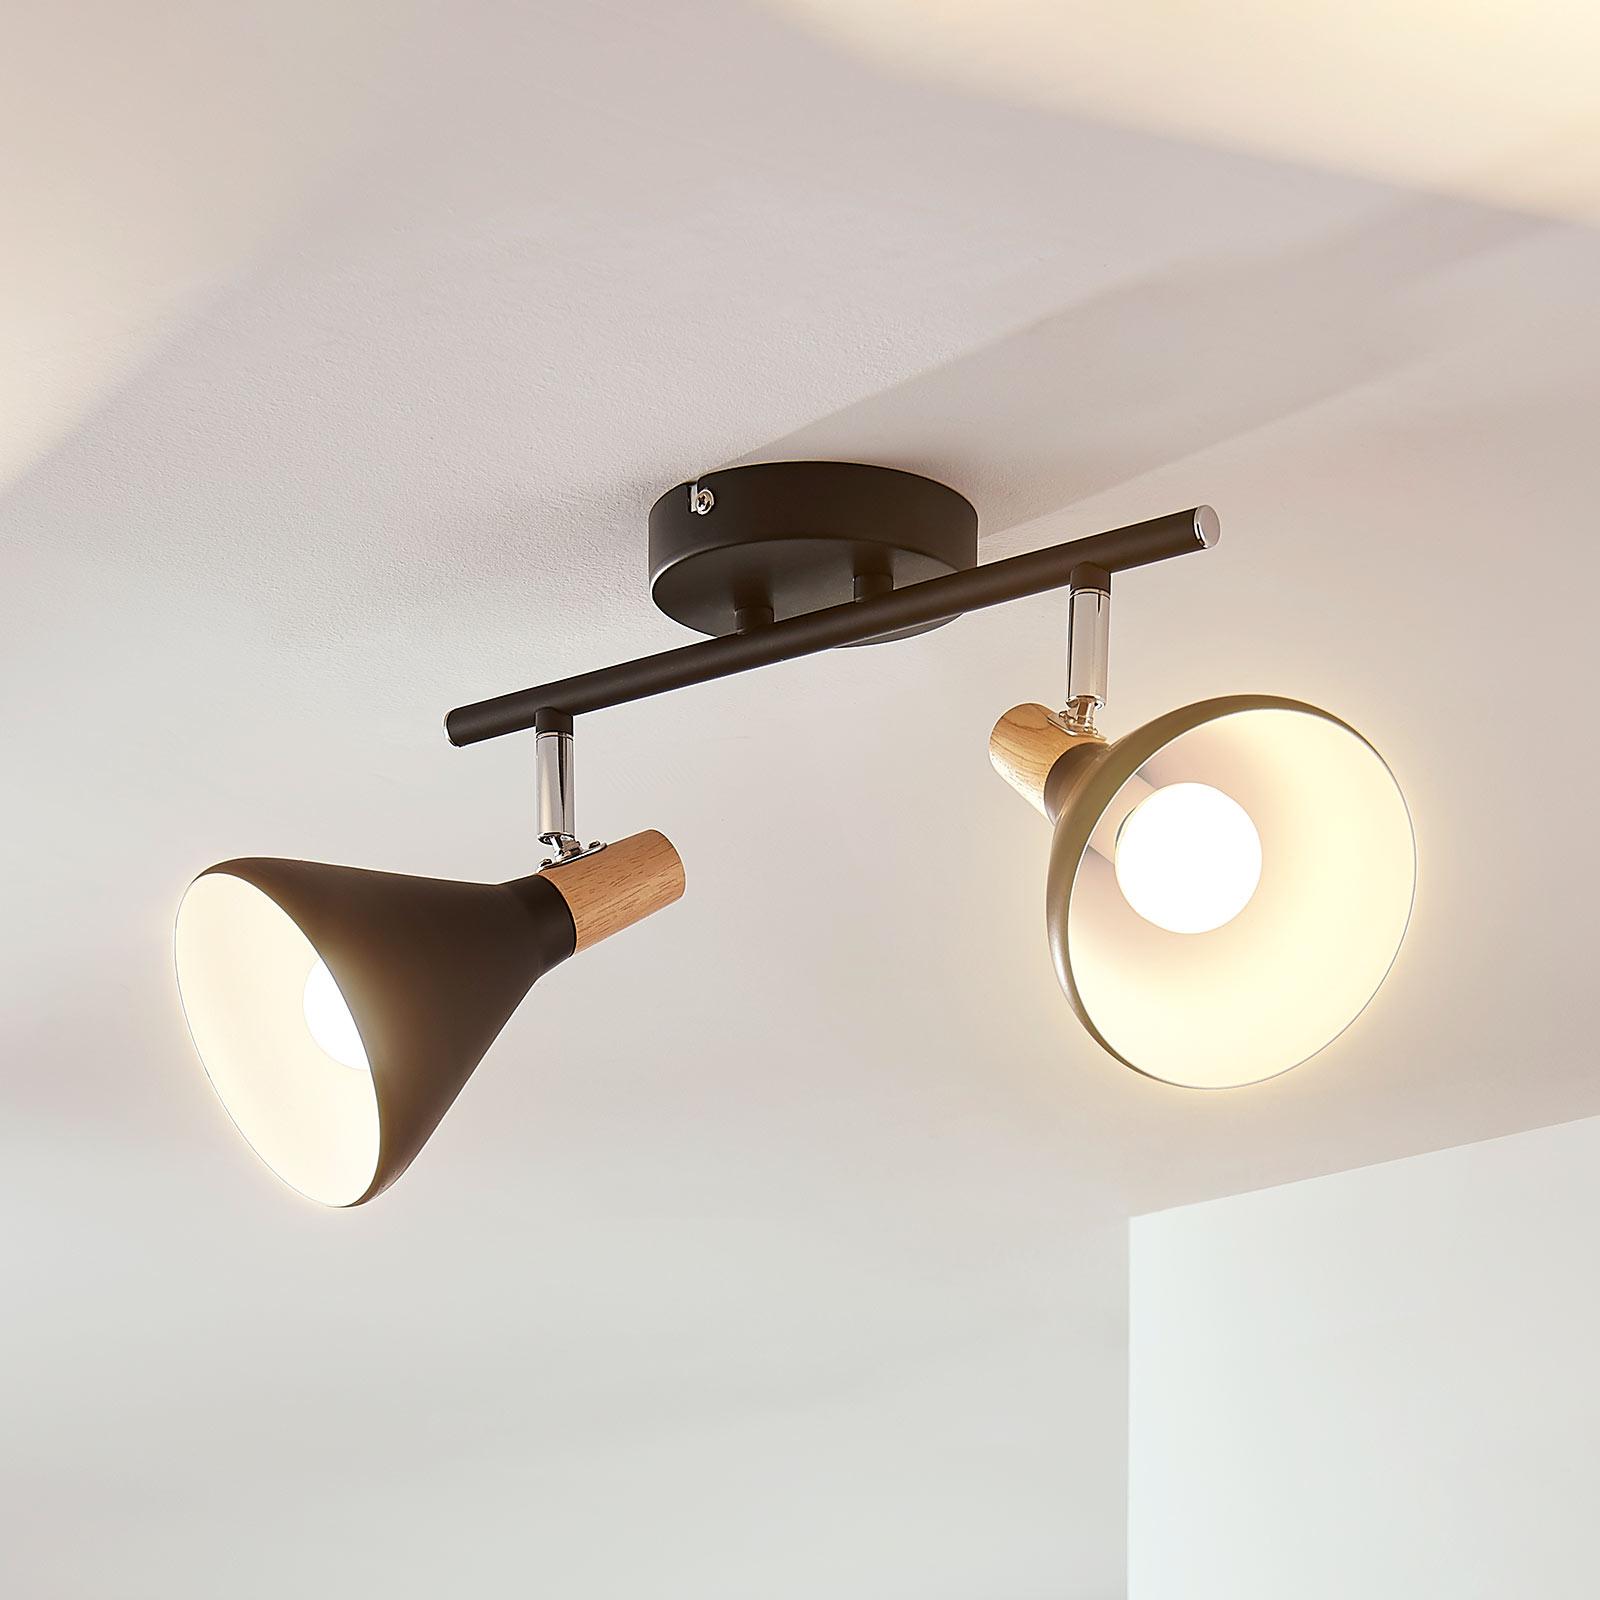 2-punktowa lampa sufitowa LED Arina, czarna